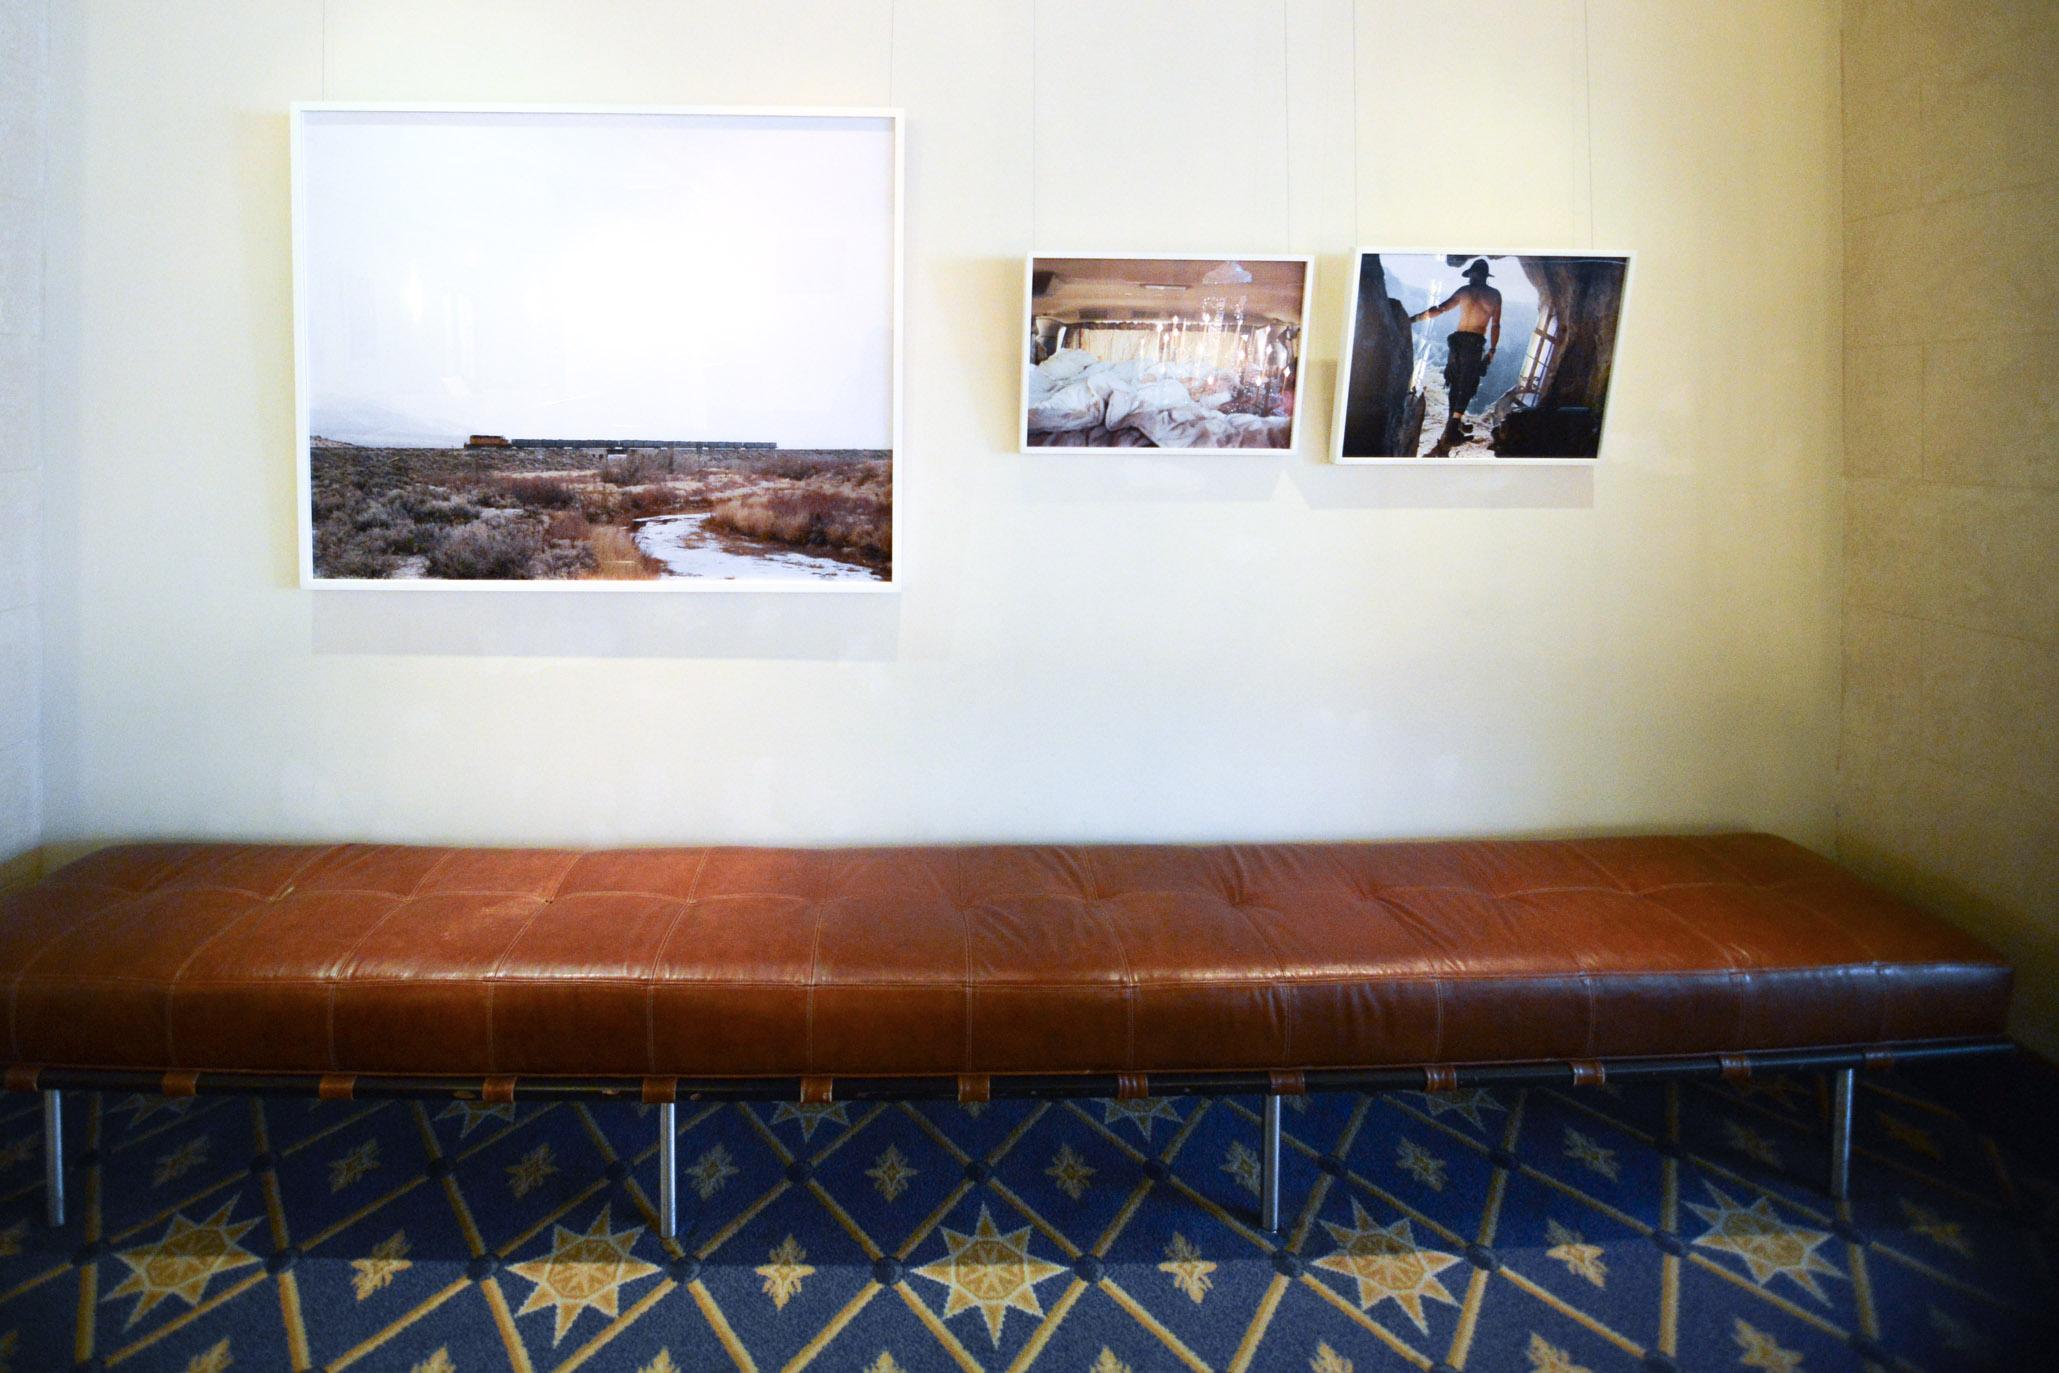 The Heathman Hotel Portland Photo Exhibit